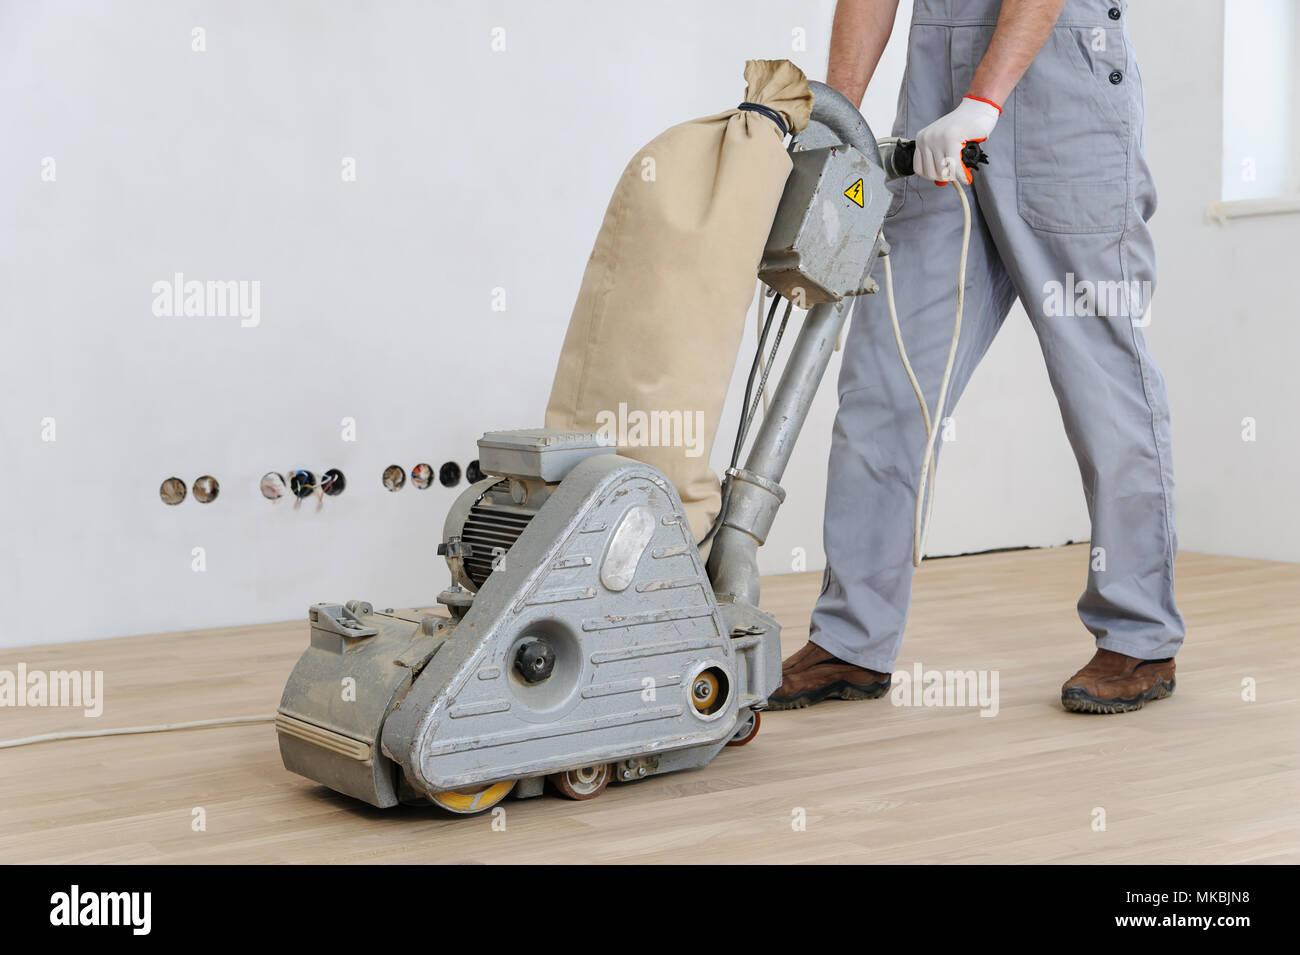 Worker polishing hardwood parquet floor with grinding machine. Stock Photo